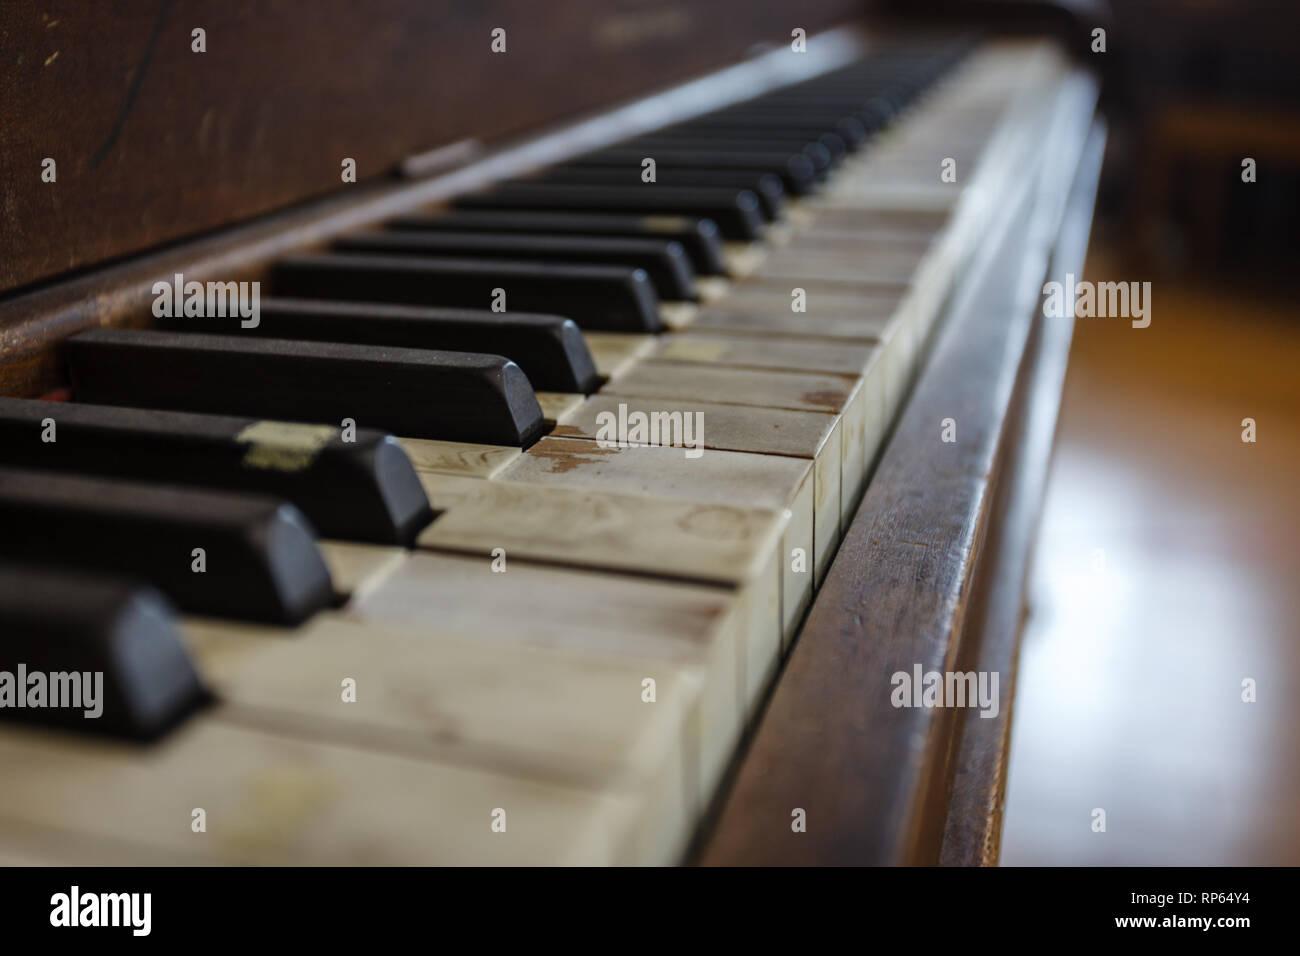 Music Maker Stock Photos & Music Maker Stock Images - Alamy